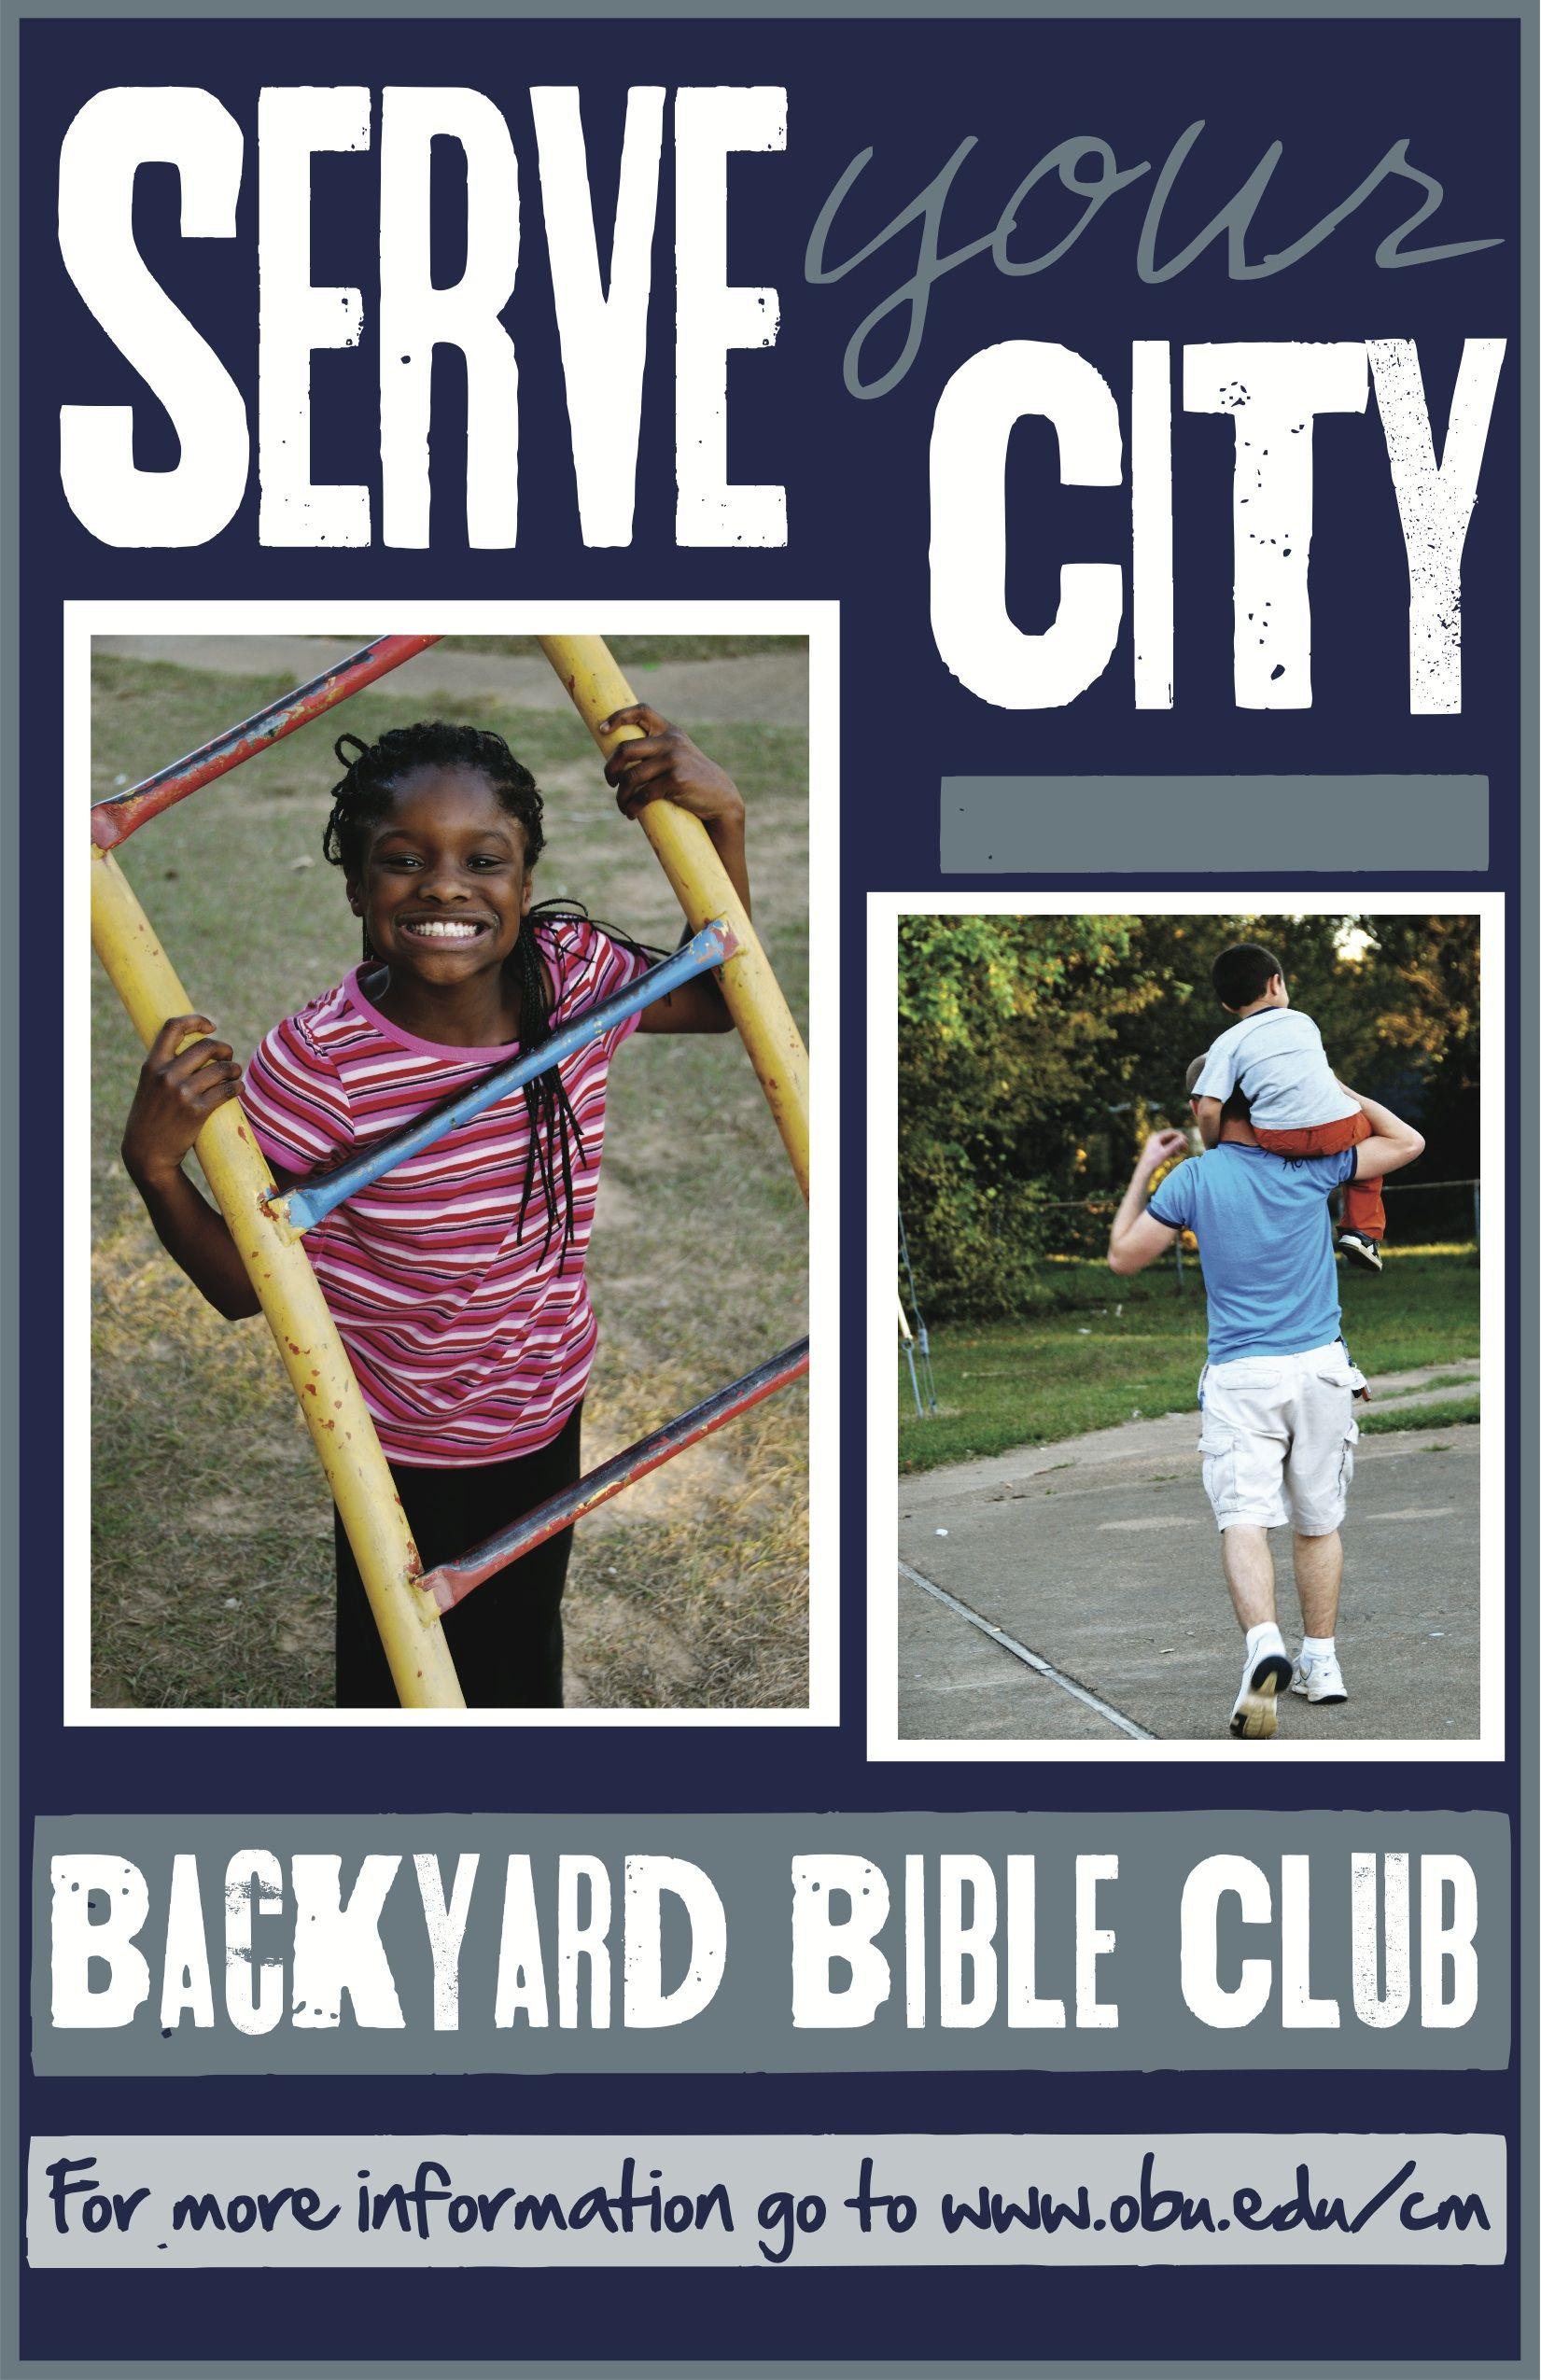 Created for OBU's Backyard Bible Club Outreach program ...